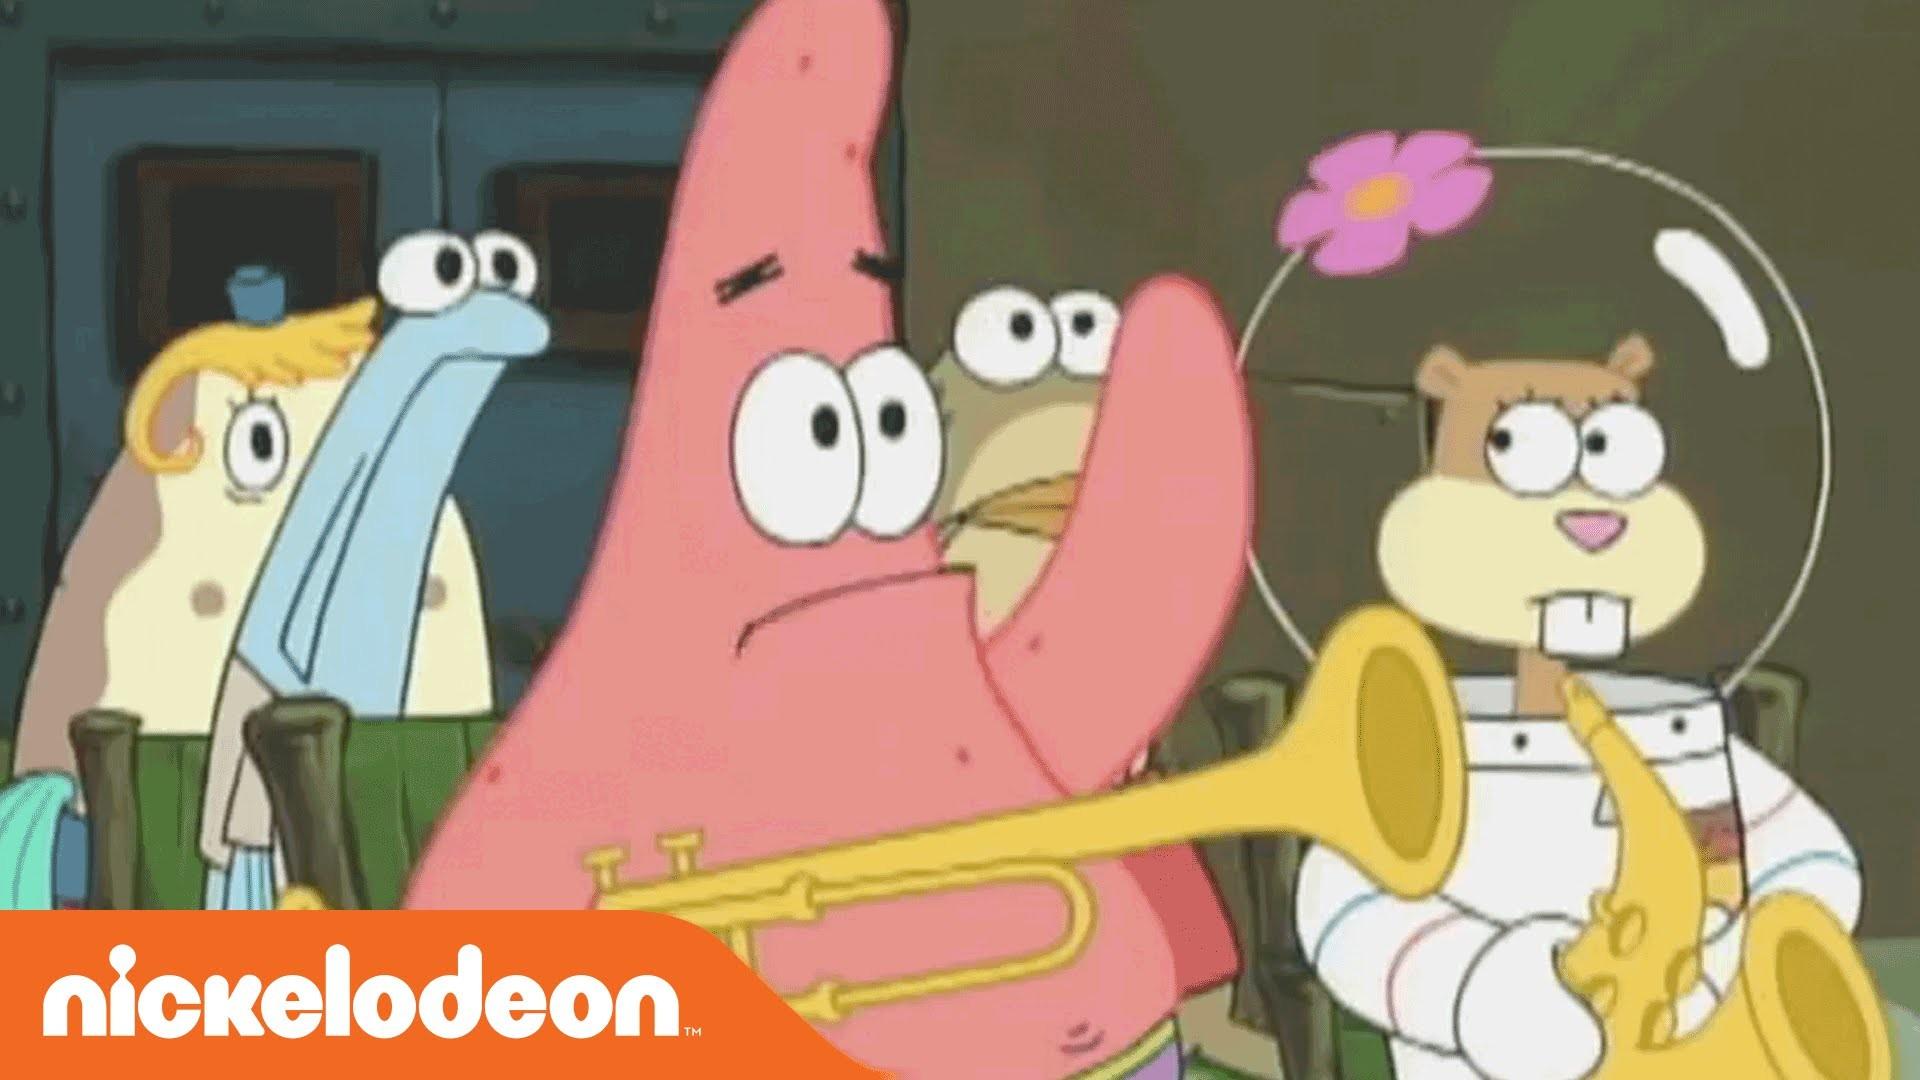 SpongeBob SquarePants | Patrick's Greatest Moments in Un-intelligence |  Nick – YouTube